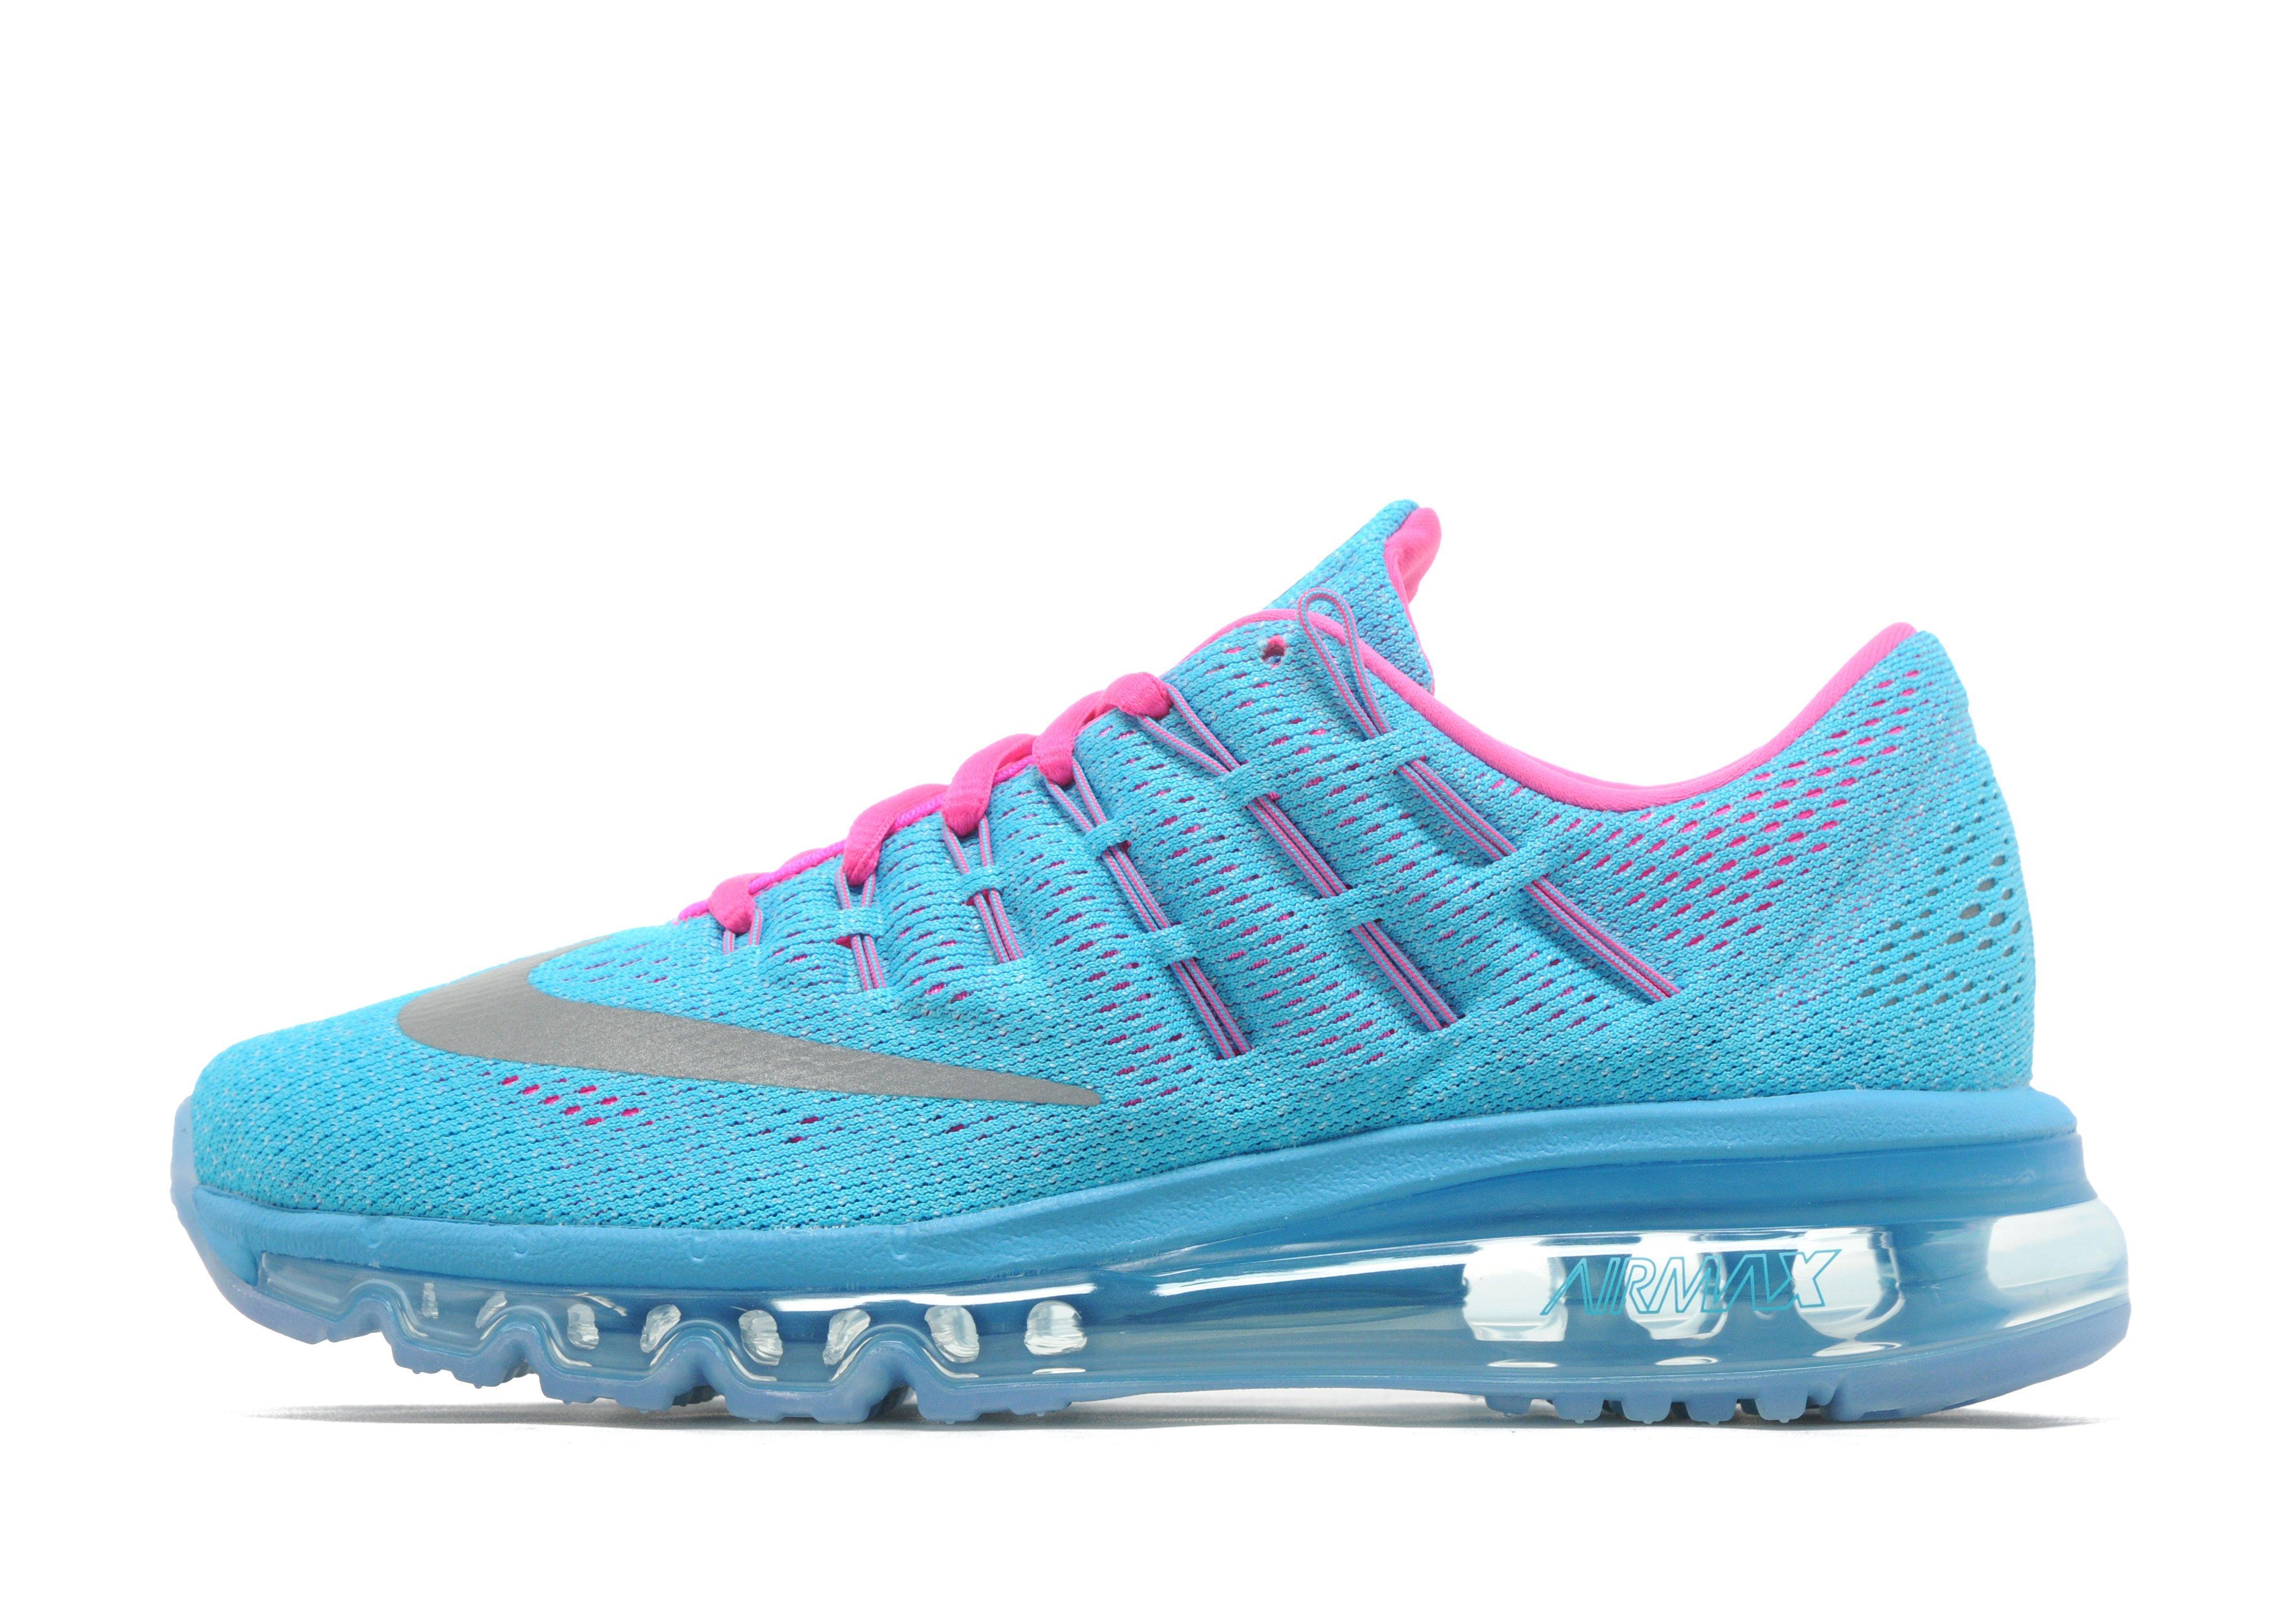 Nike Air Max 2016 Roze Grijs